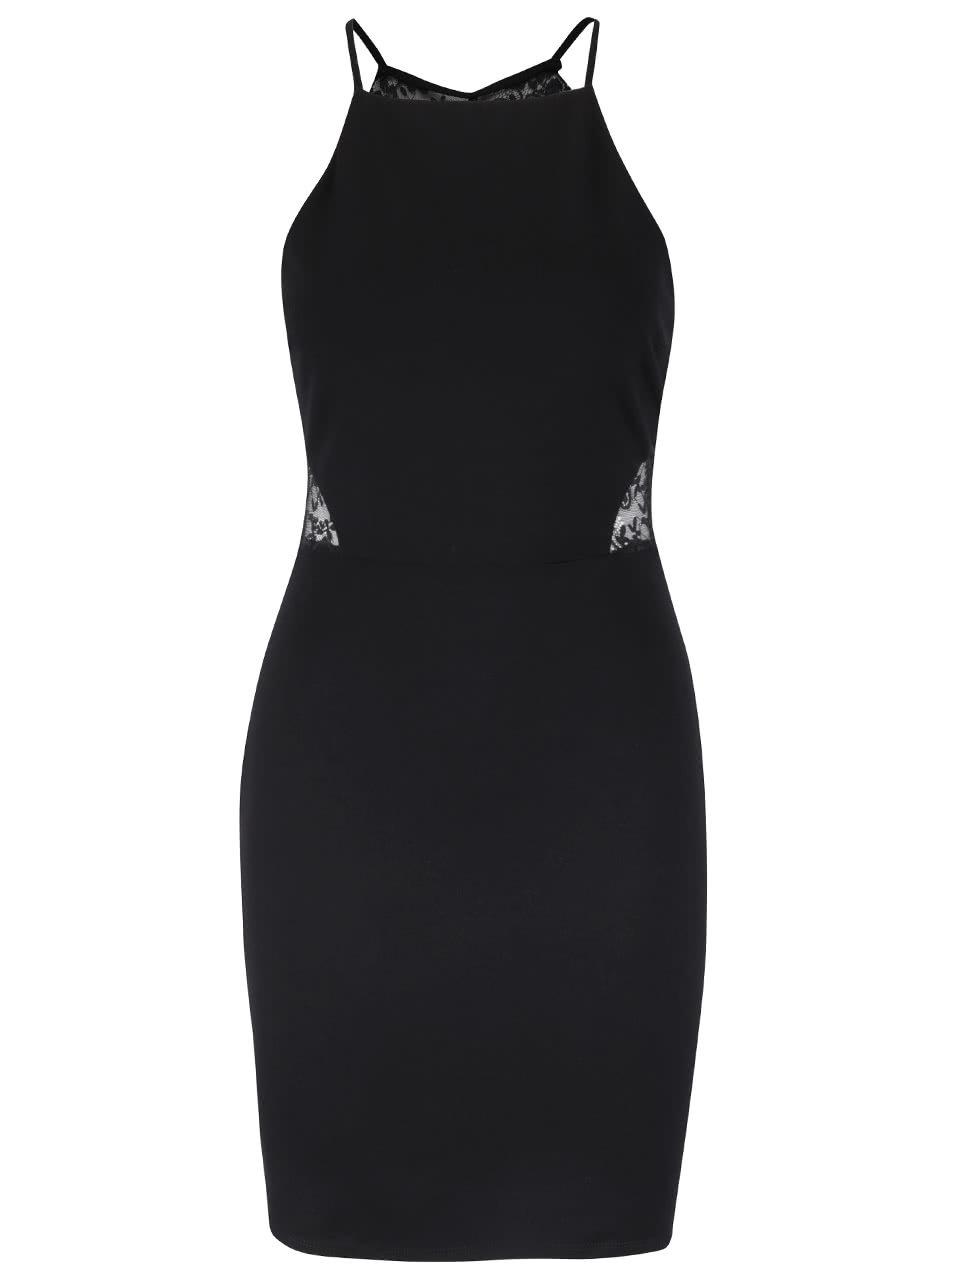 585b057aede6 Čierne šaty s čipkou na chrbte Miss Selfridge ...